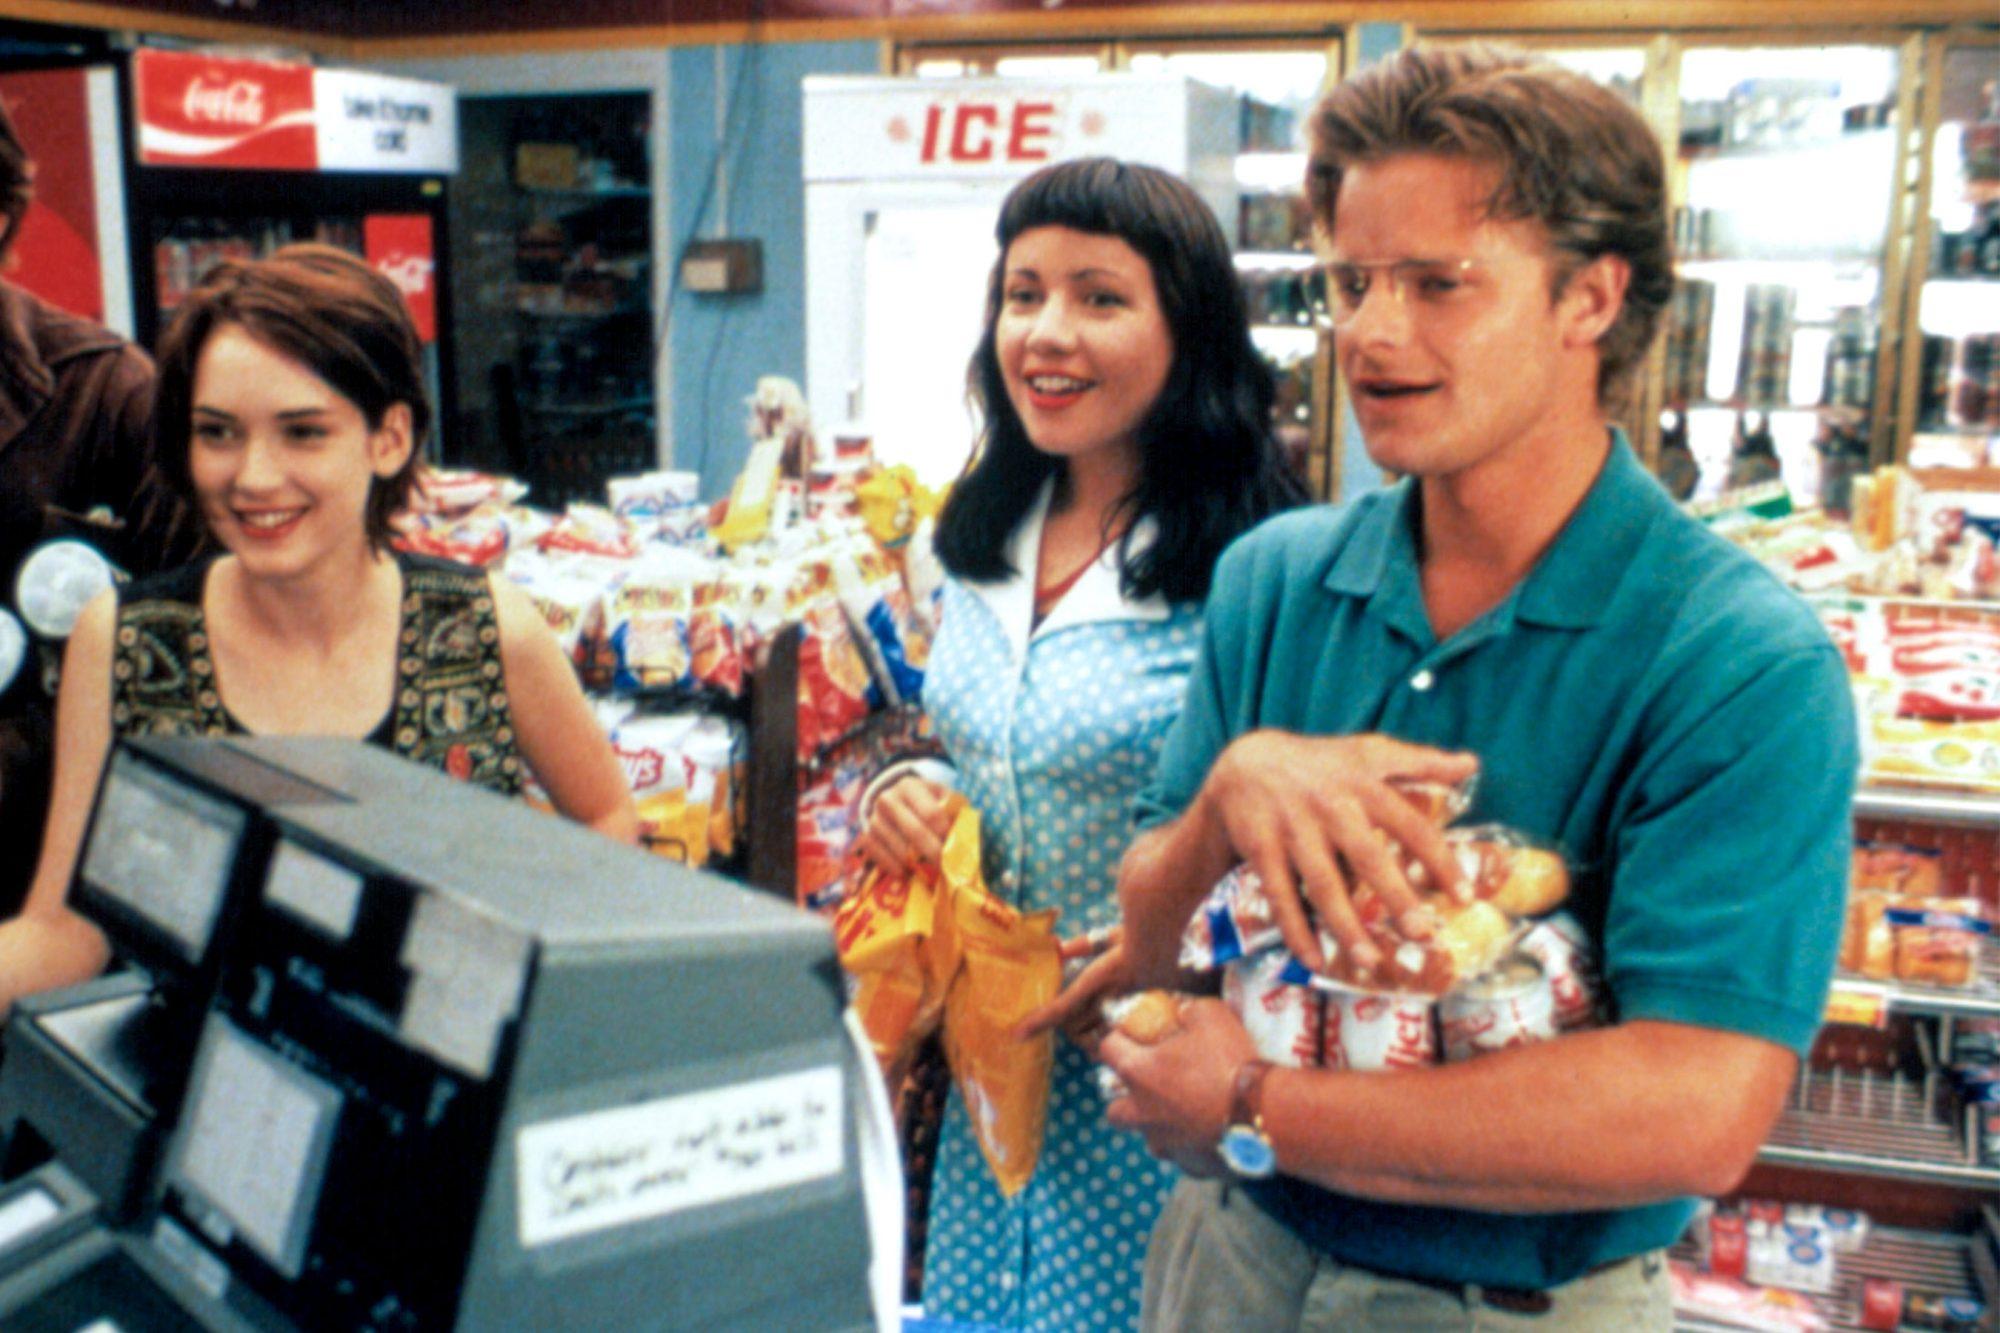 REALITY BITES, Ethan Hawke, Winona Ryder, Janeane Garofalo, Steve Zahn, 1994, (c) Universal/courtesy